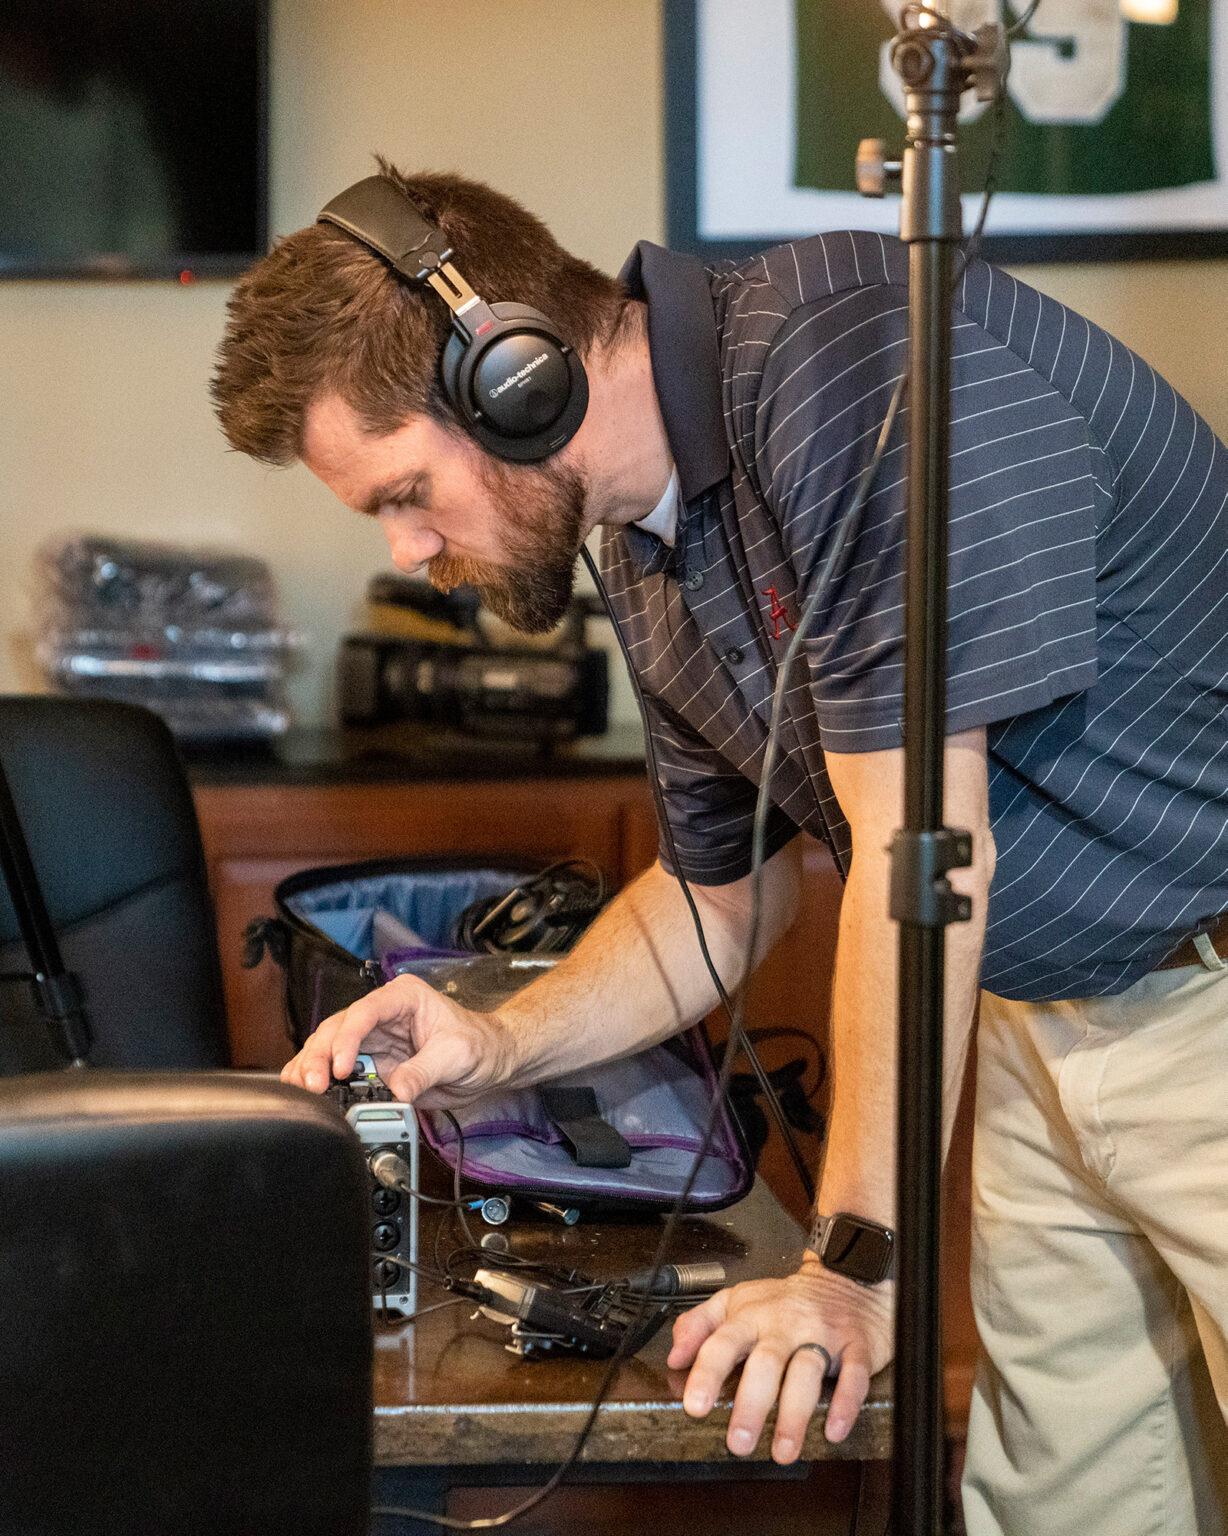 Phillip with camera and audio equipment